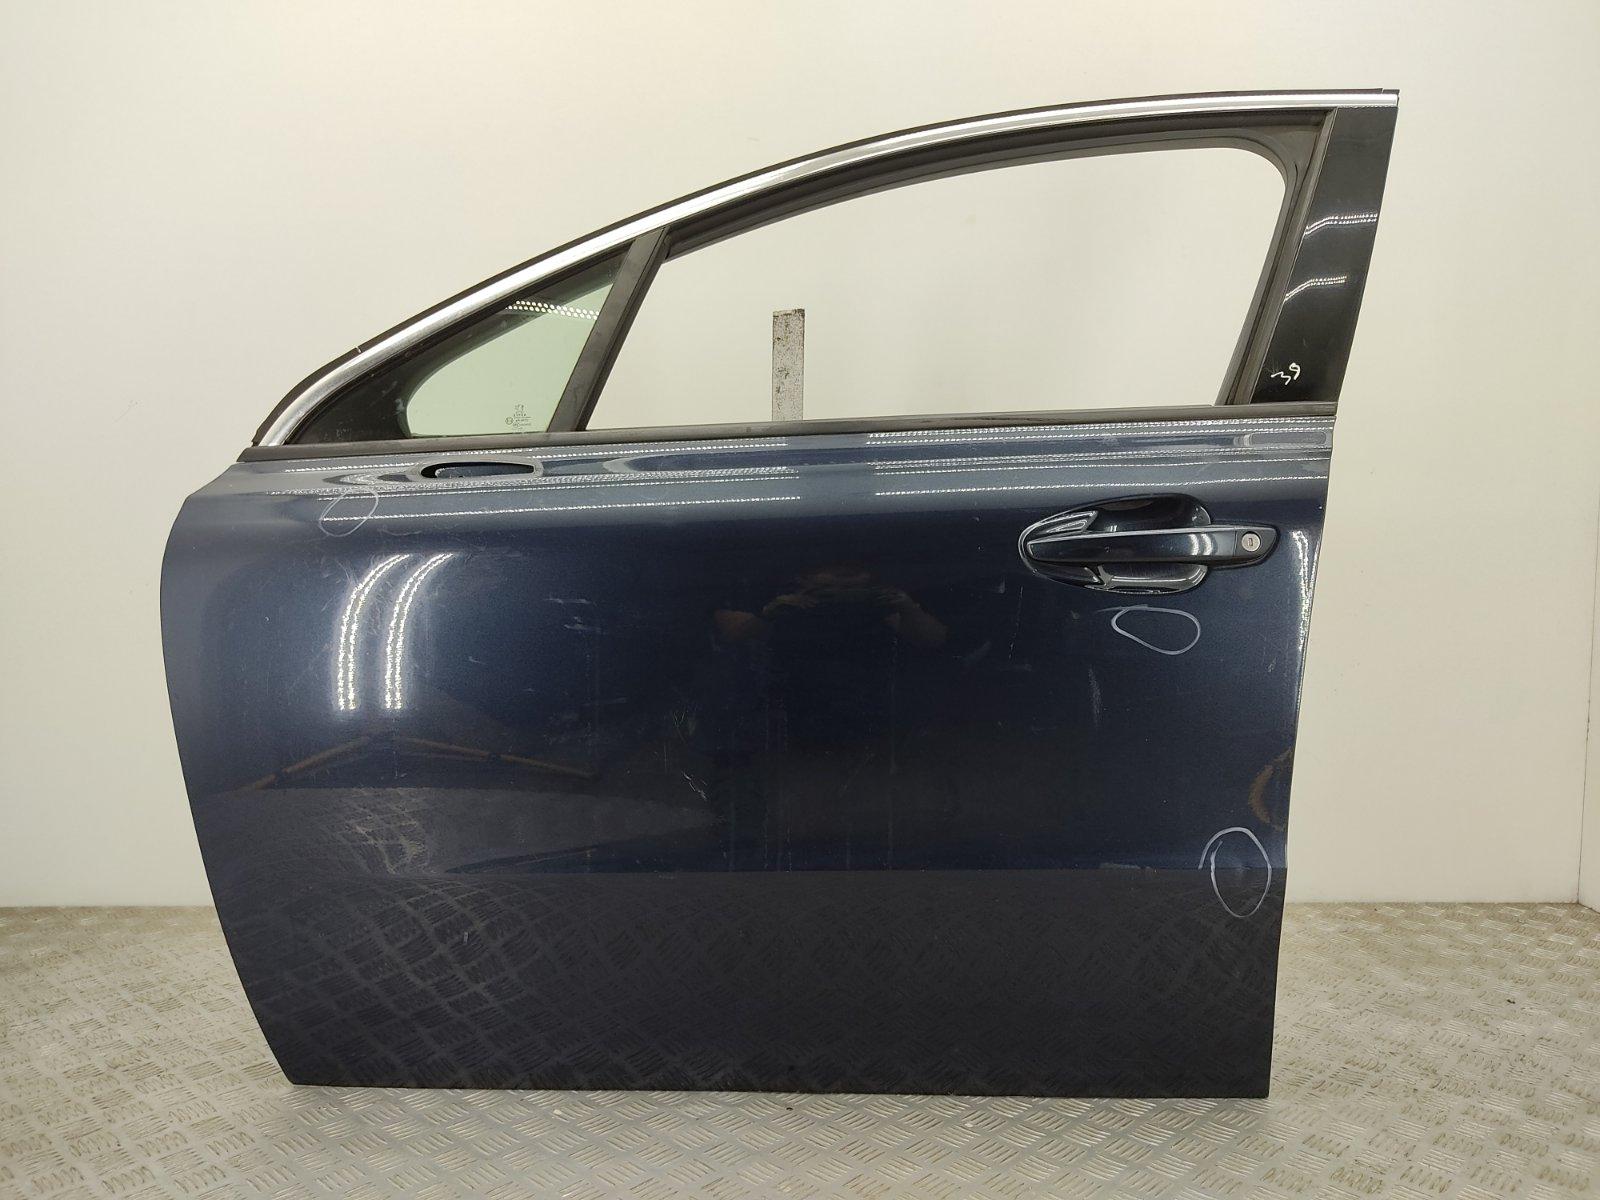 Дверь передняя левая Peugeot 508 1.6 HDI 2011 (б/у)